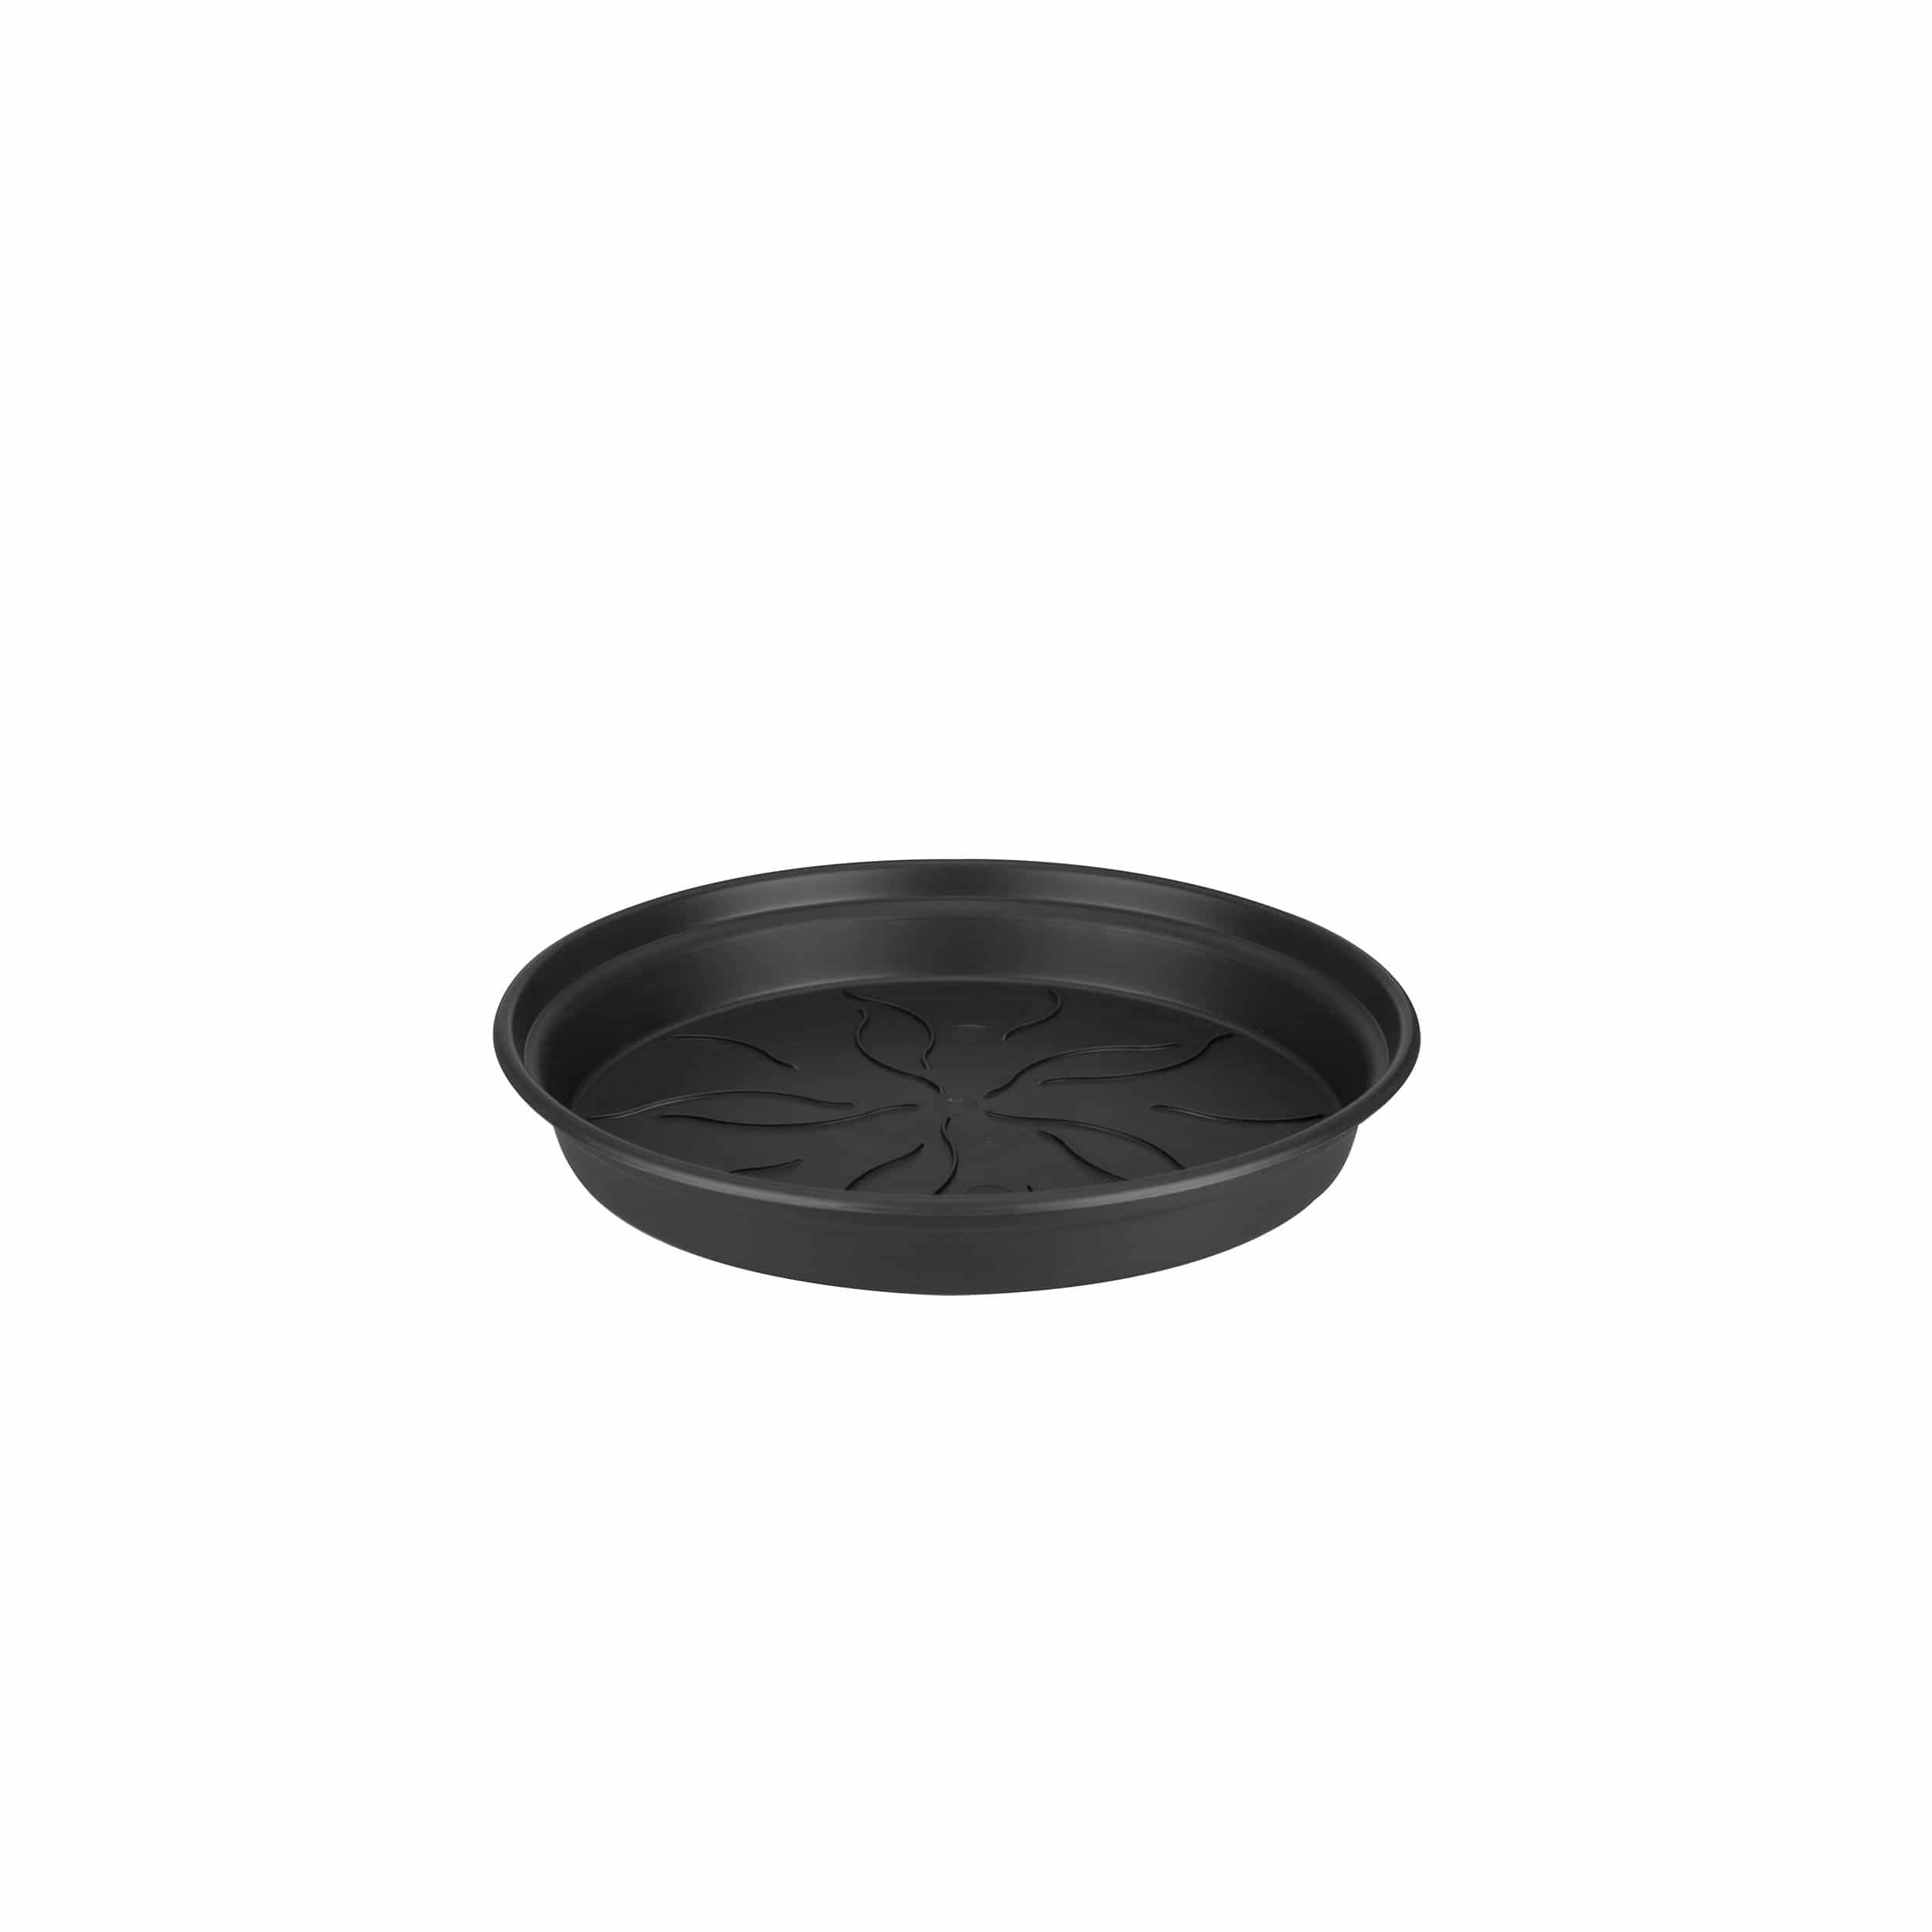 Blumentopf-Untersetzer Green Basics D14cm lebhaft schwarz